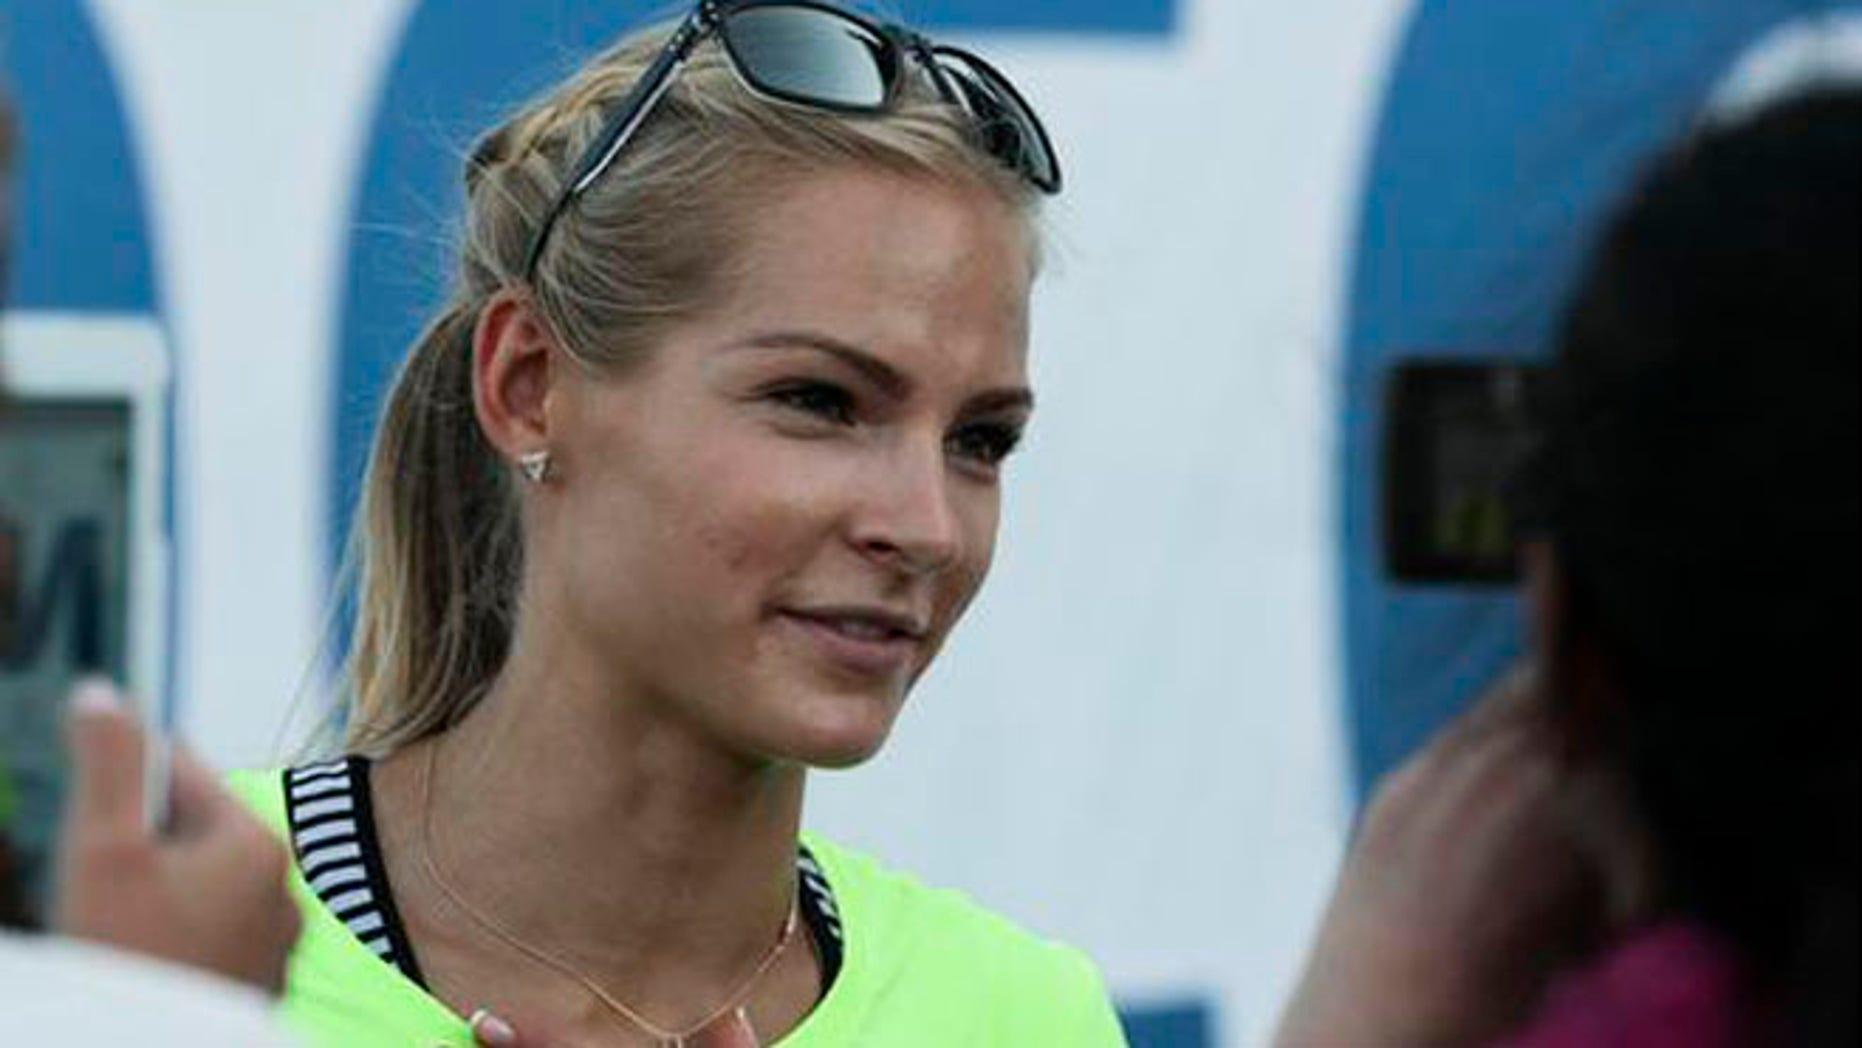 Russia's long jumper Darya Klishina speaks at a track meet in June.